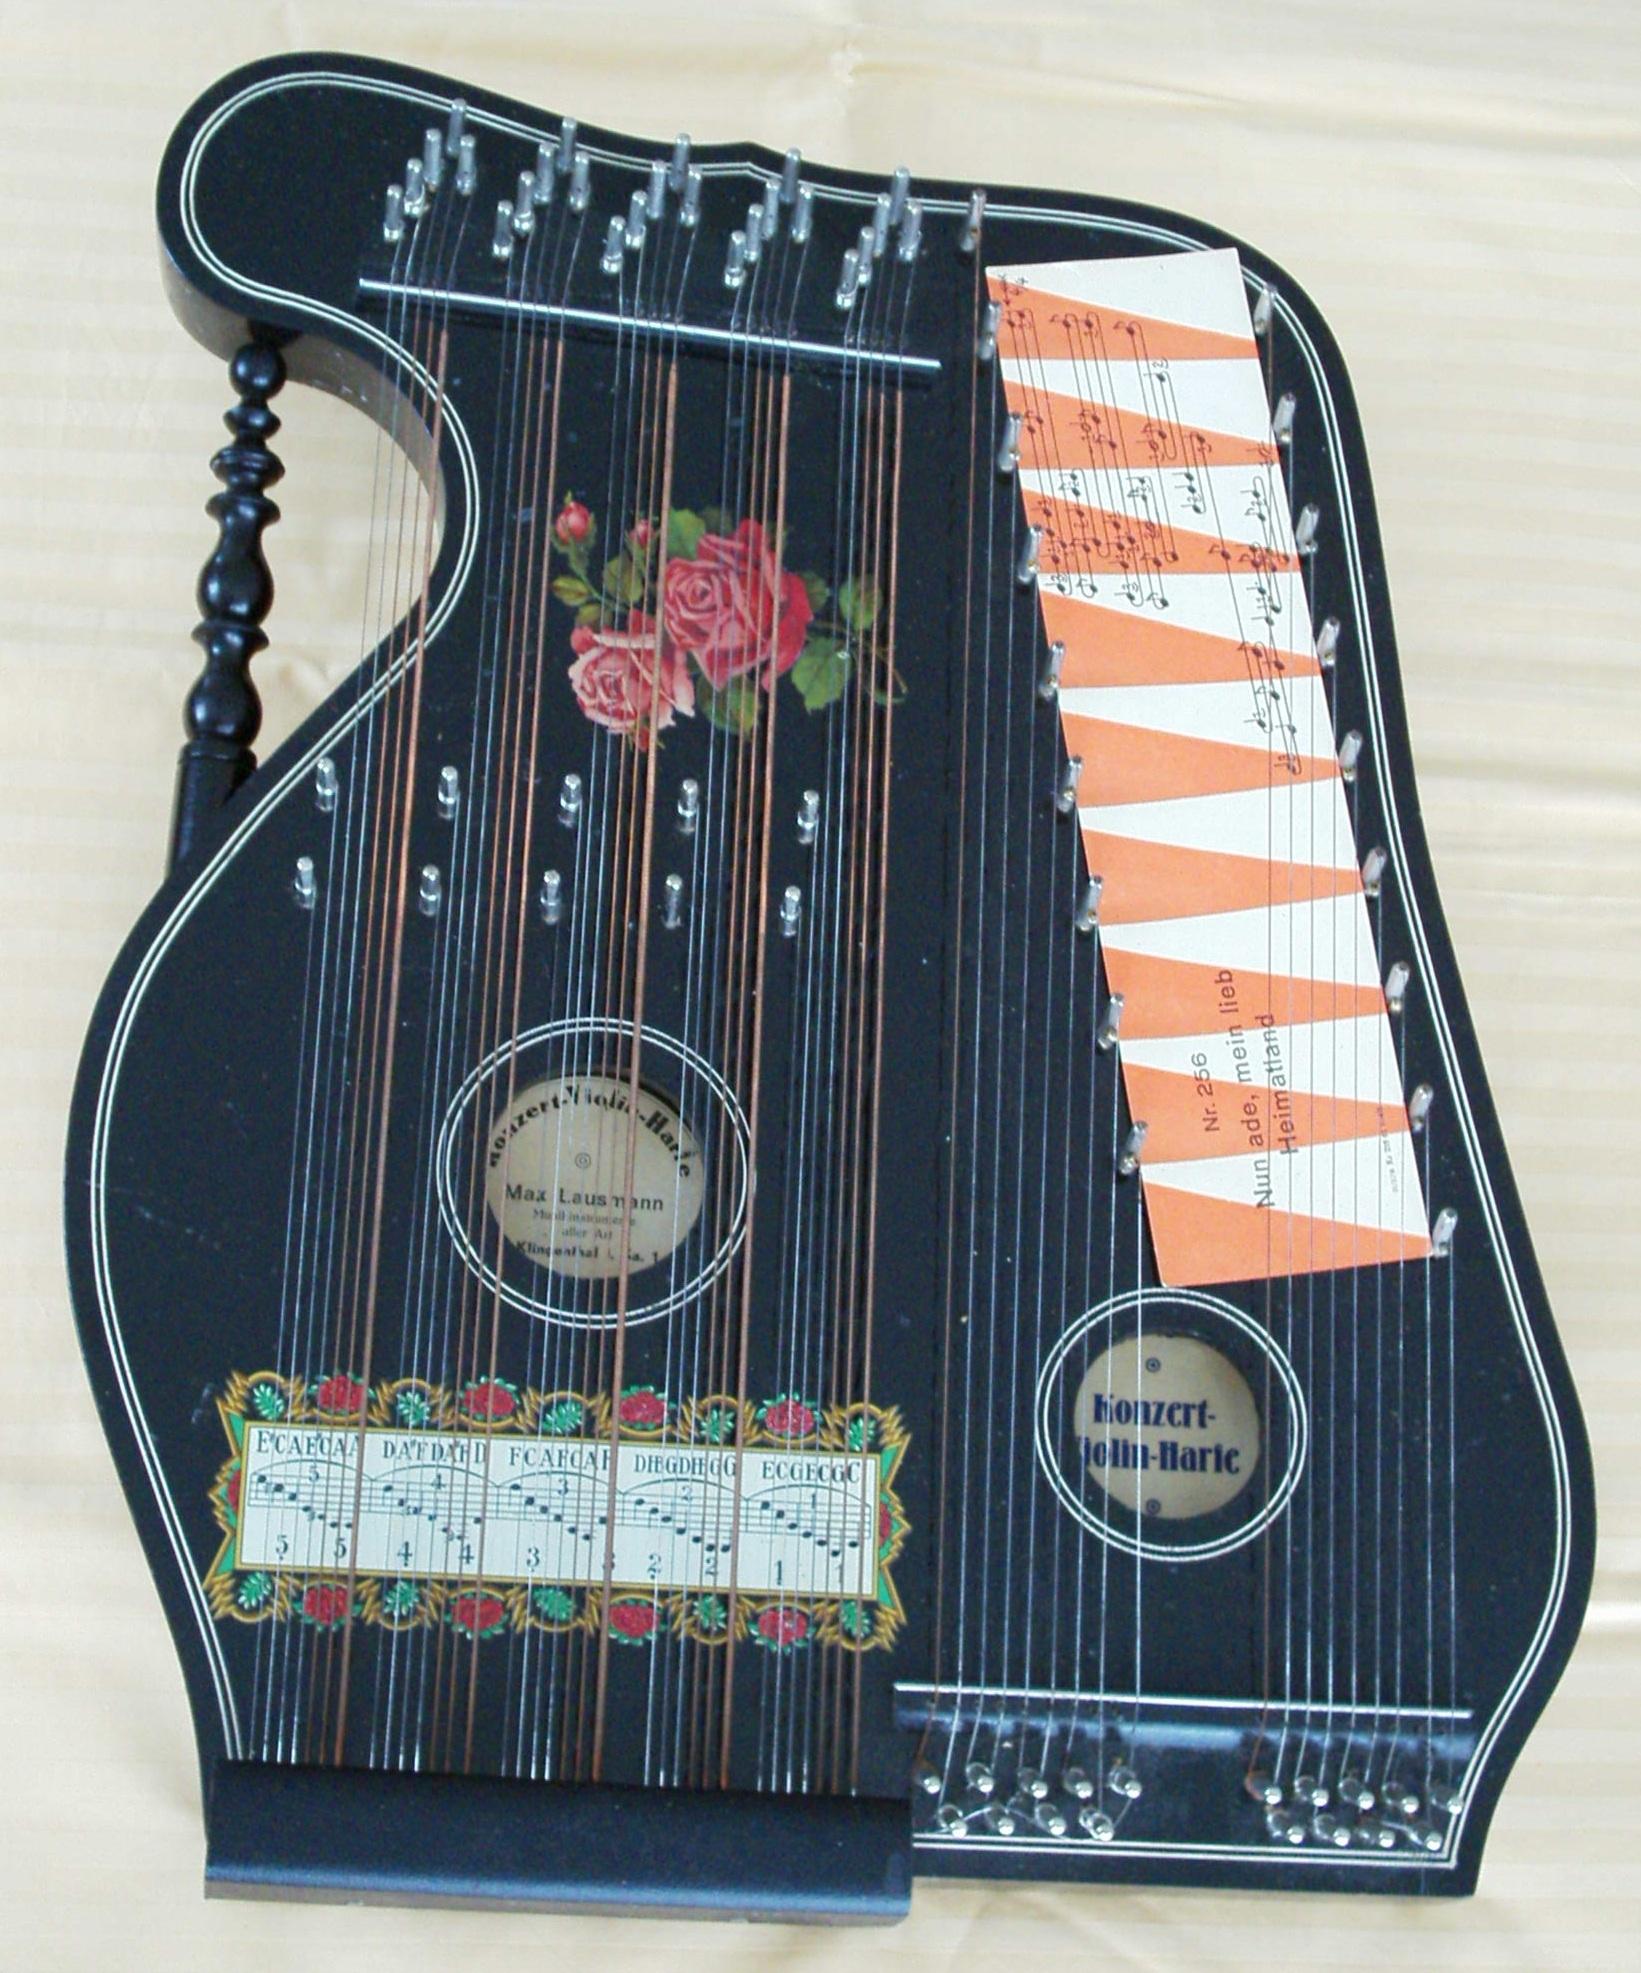 Violinzither